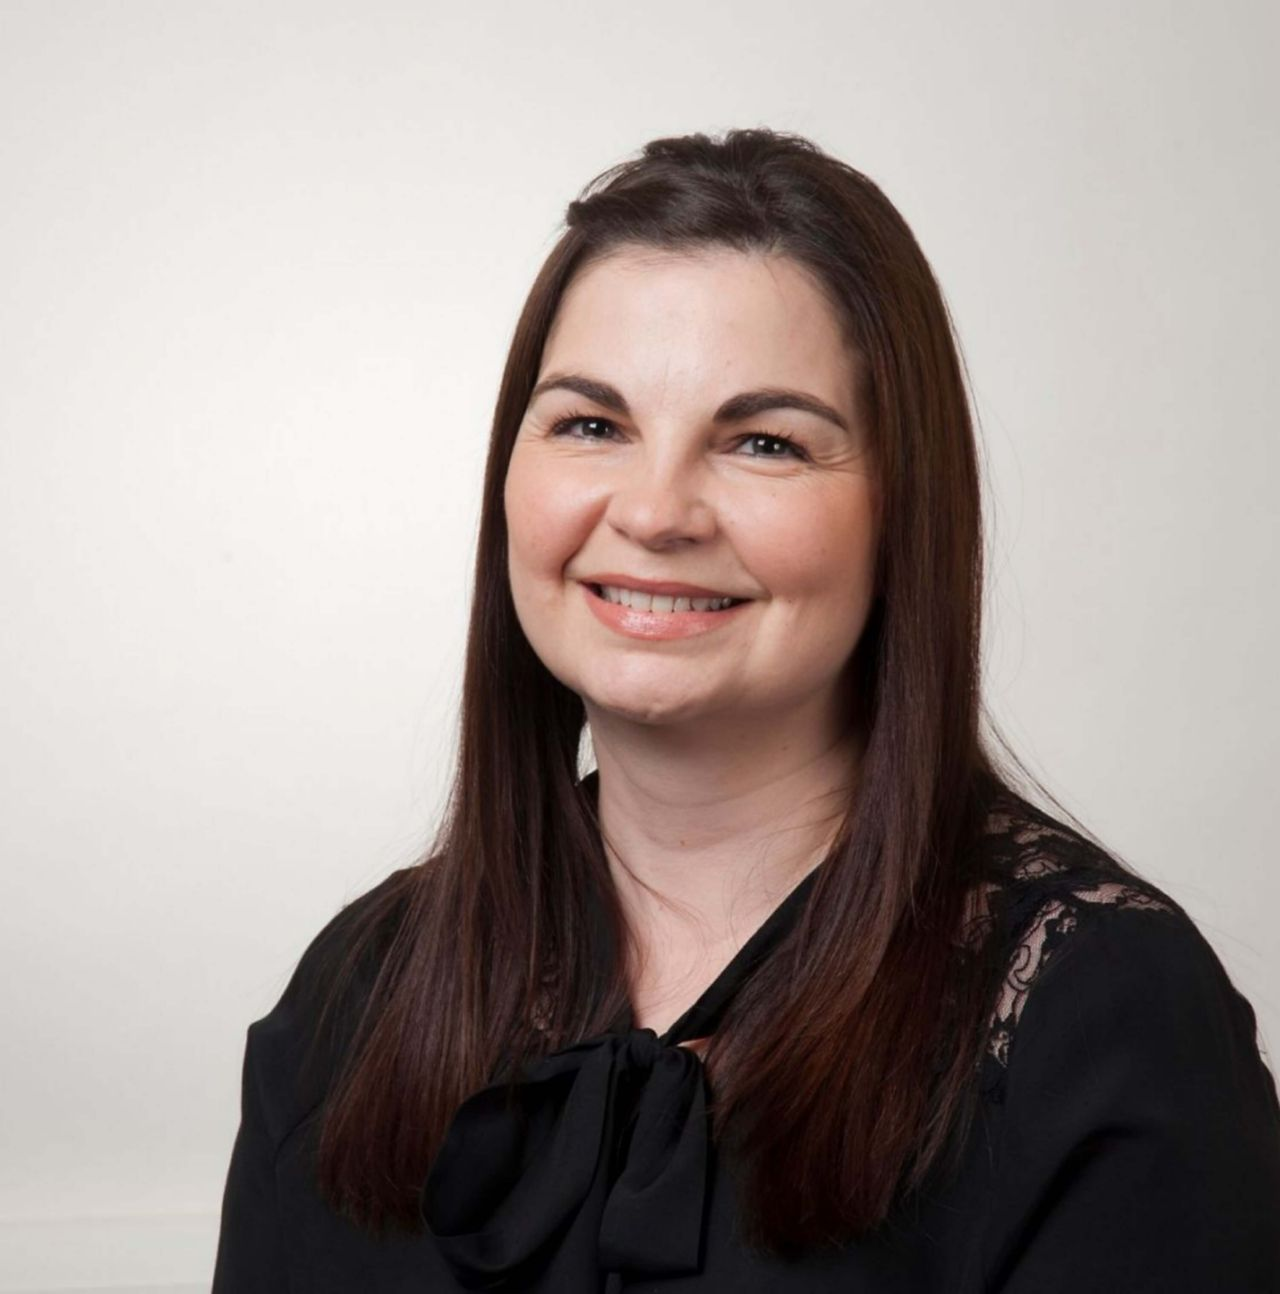 Naomi Gornall, Major Project Manager